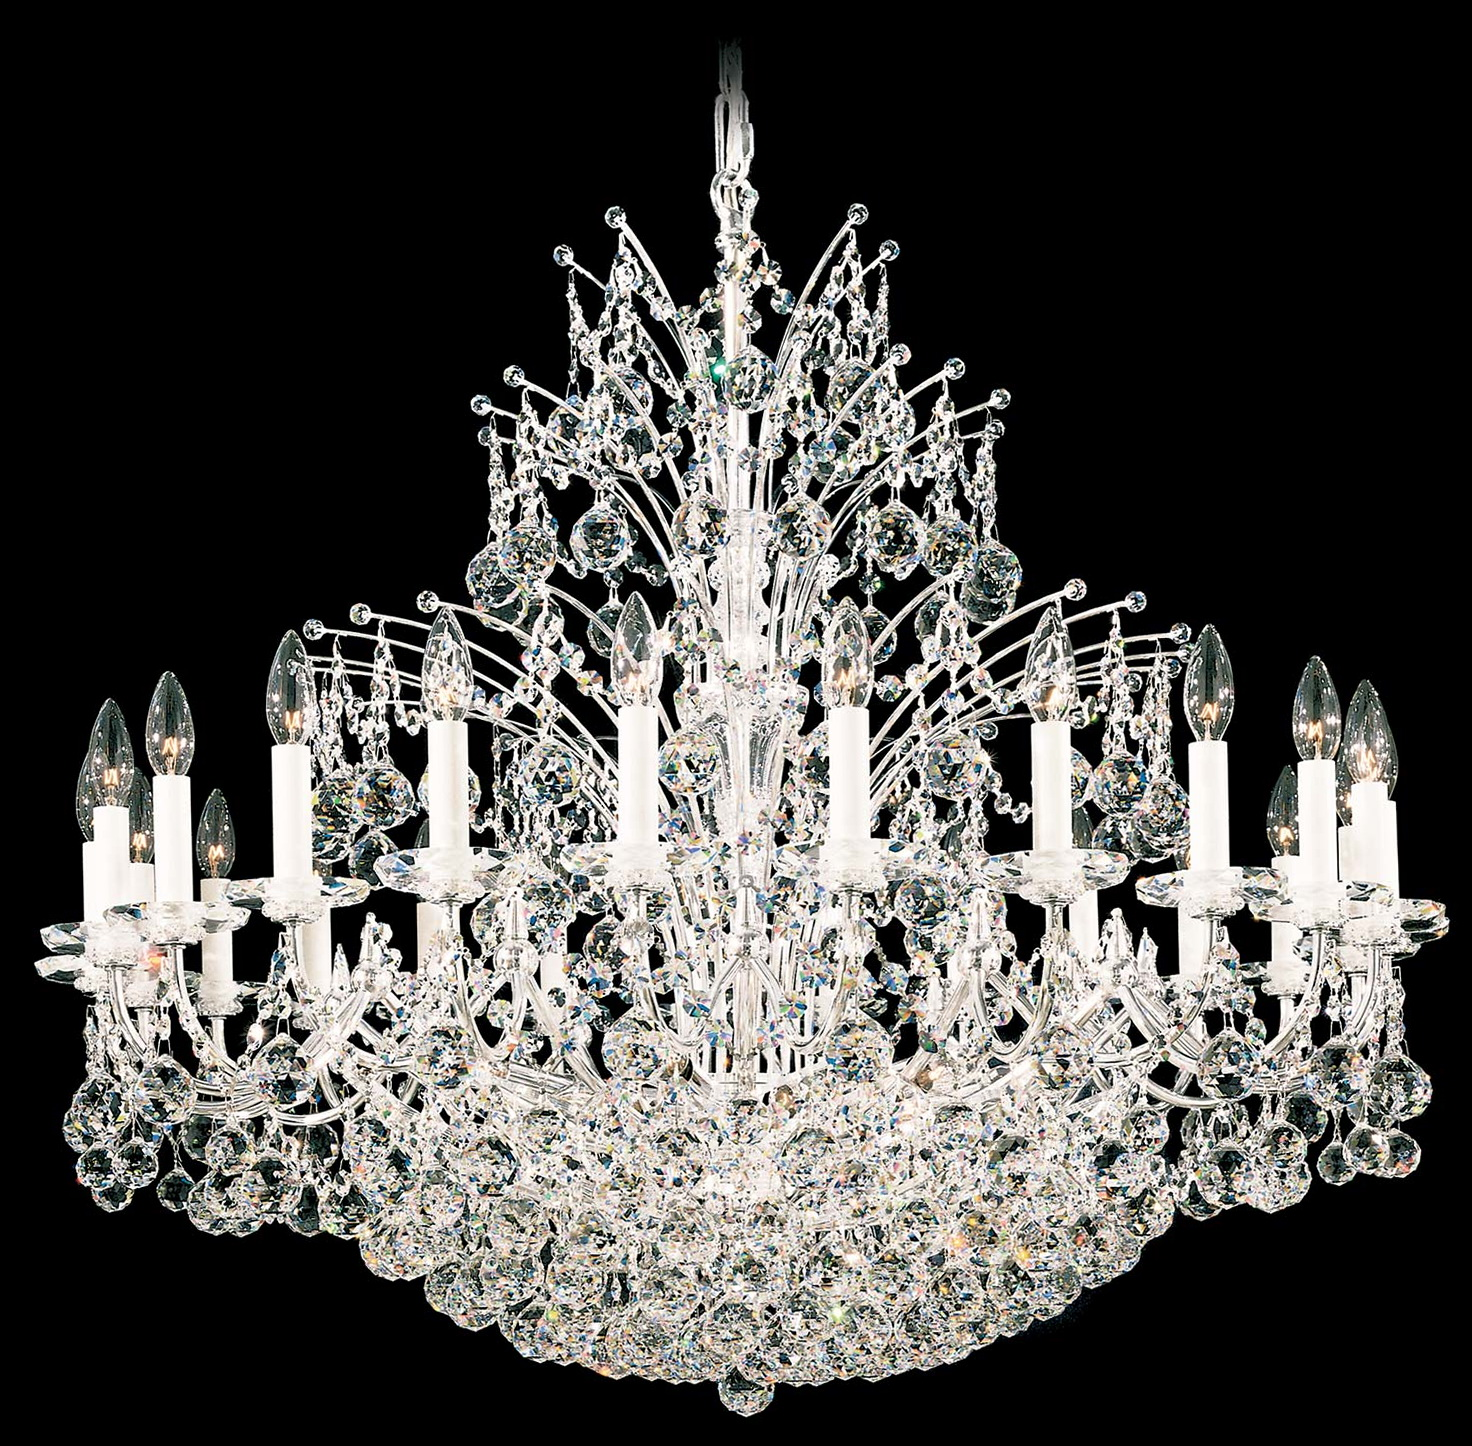 Crystal Chandelier Price: Schonbek Crystal Chandelier Prices